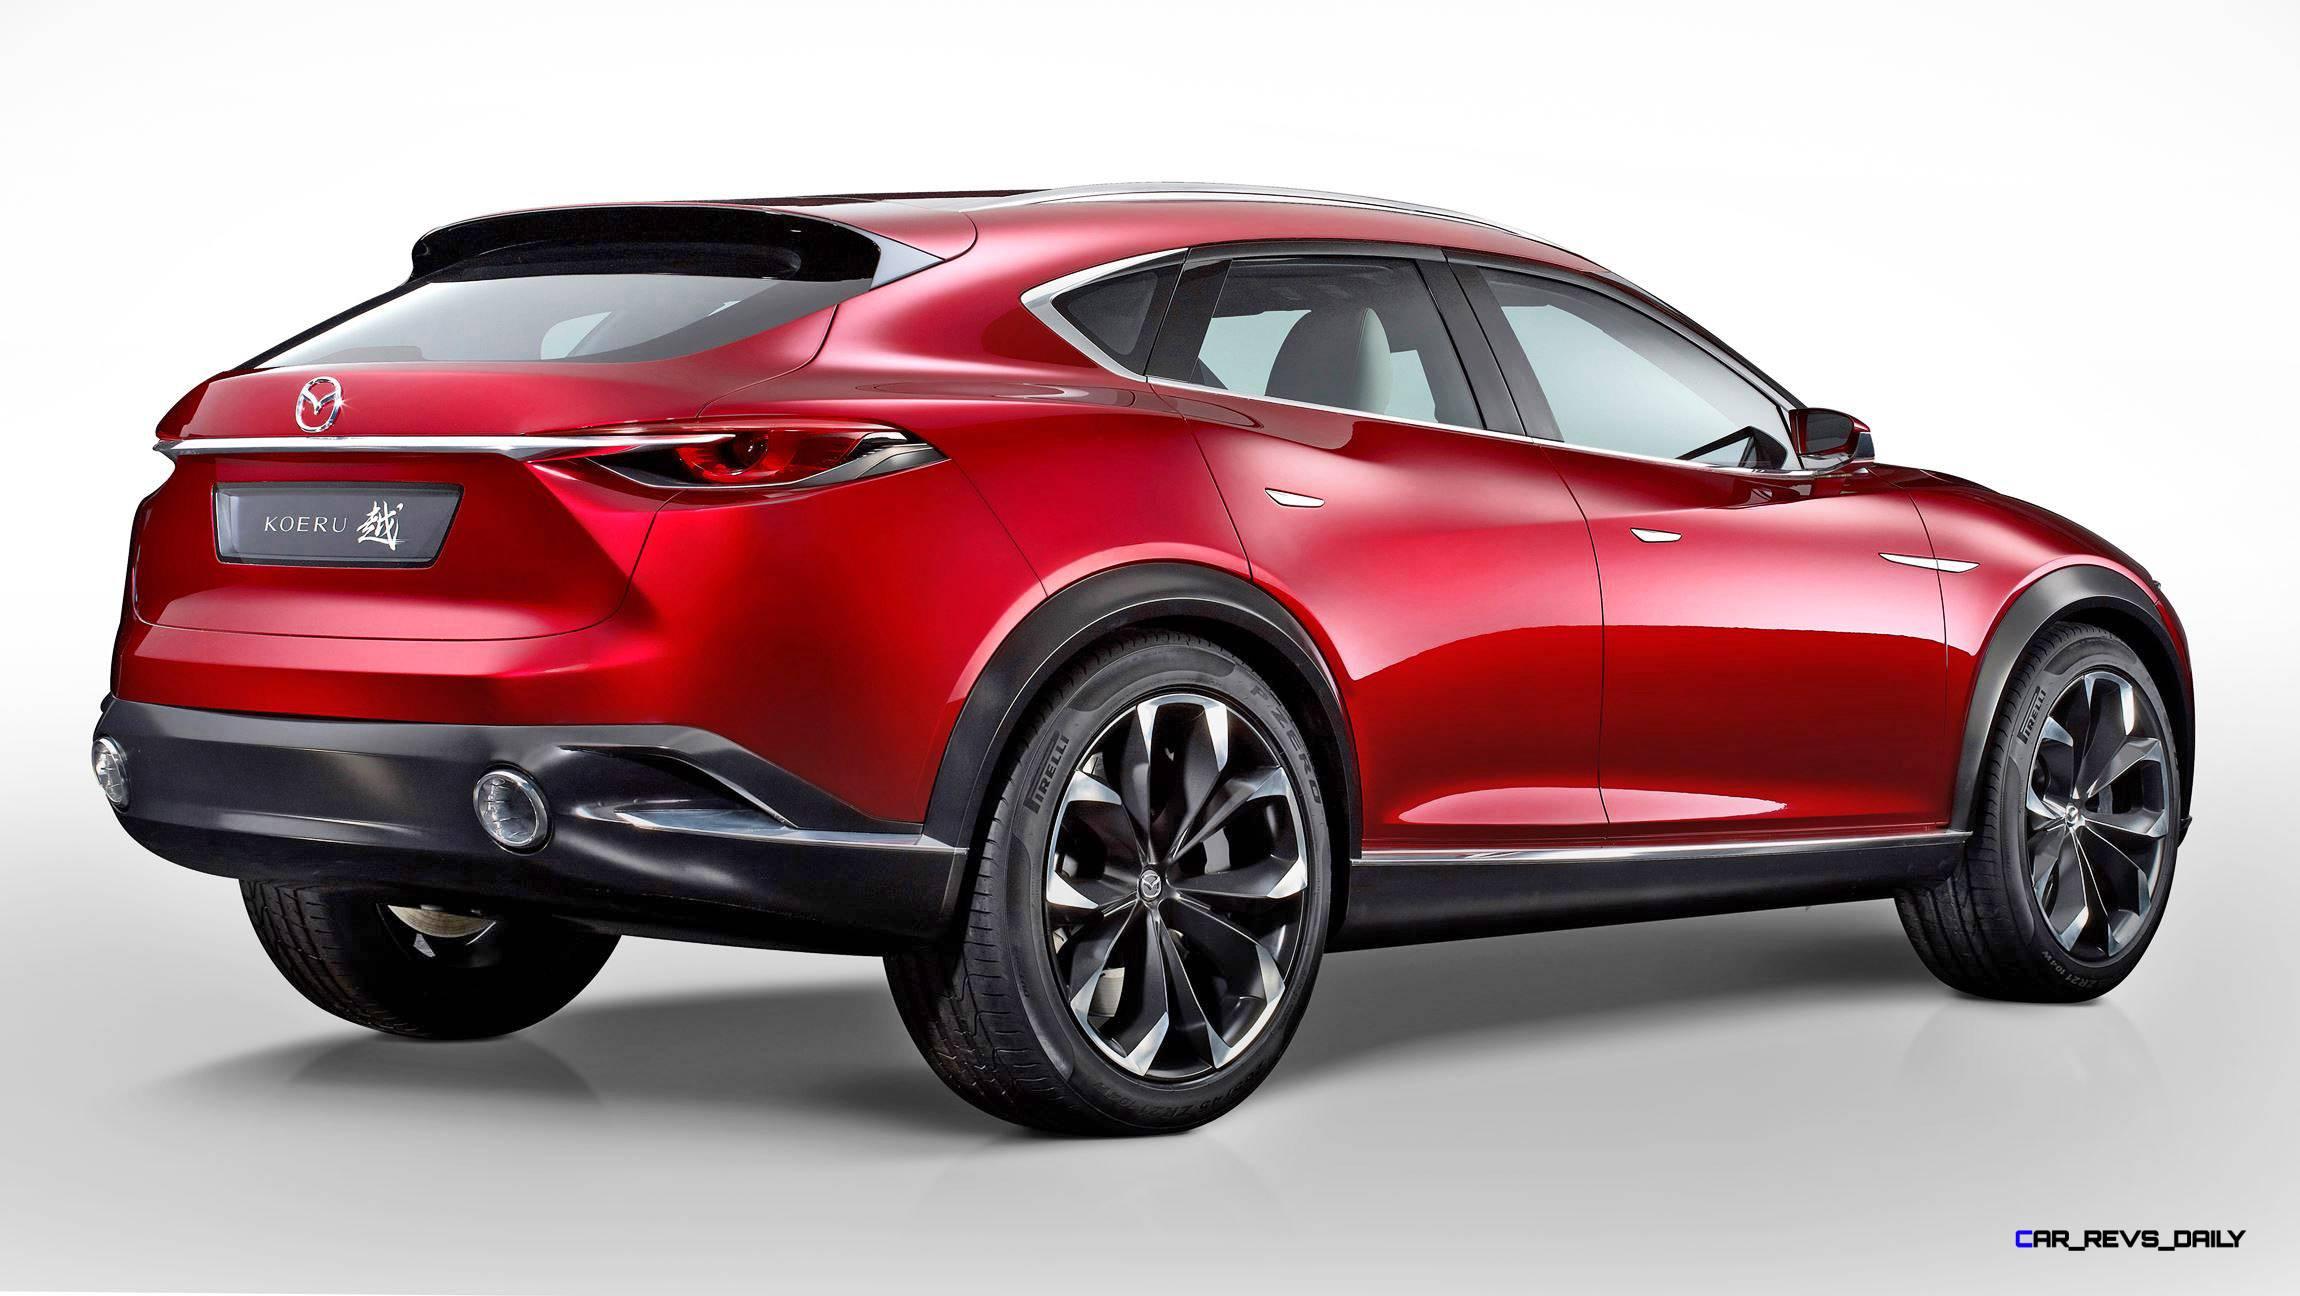 2015 Mazda KOERU Concept - 219.0KB